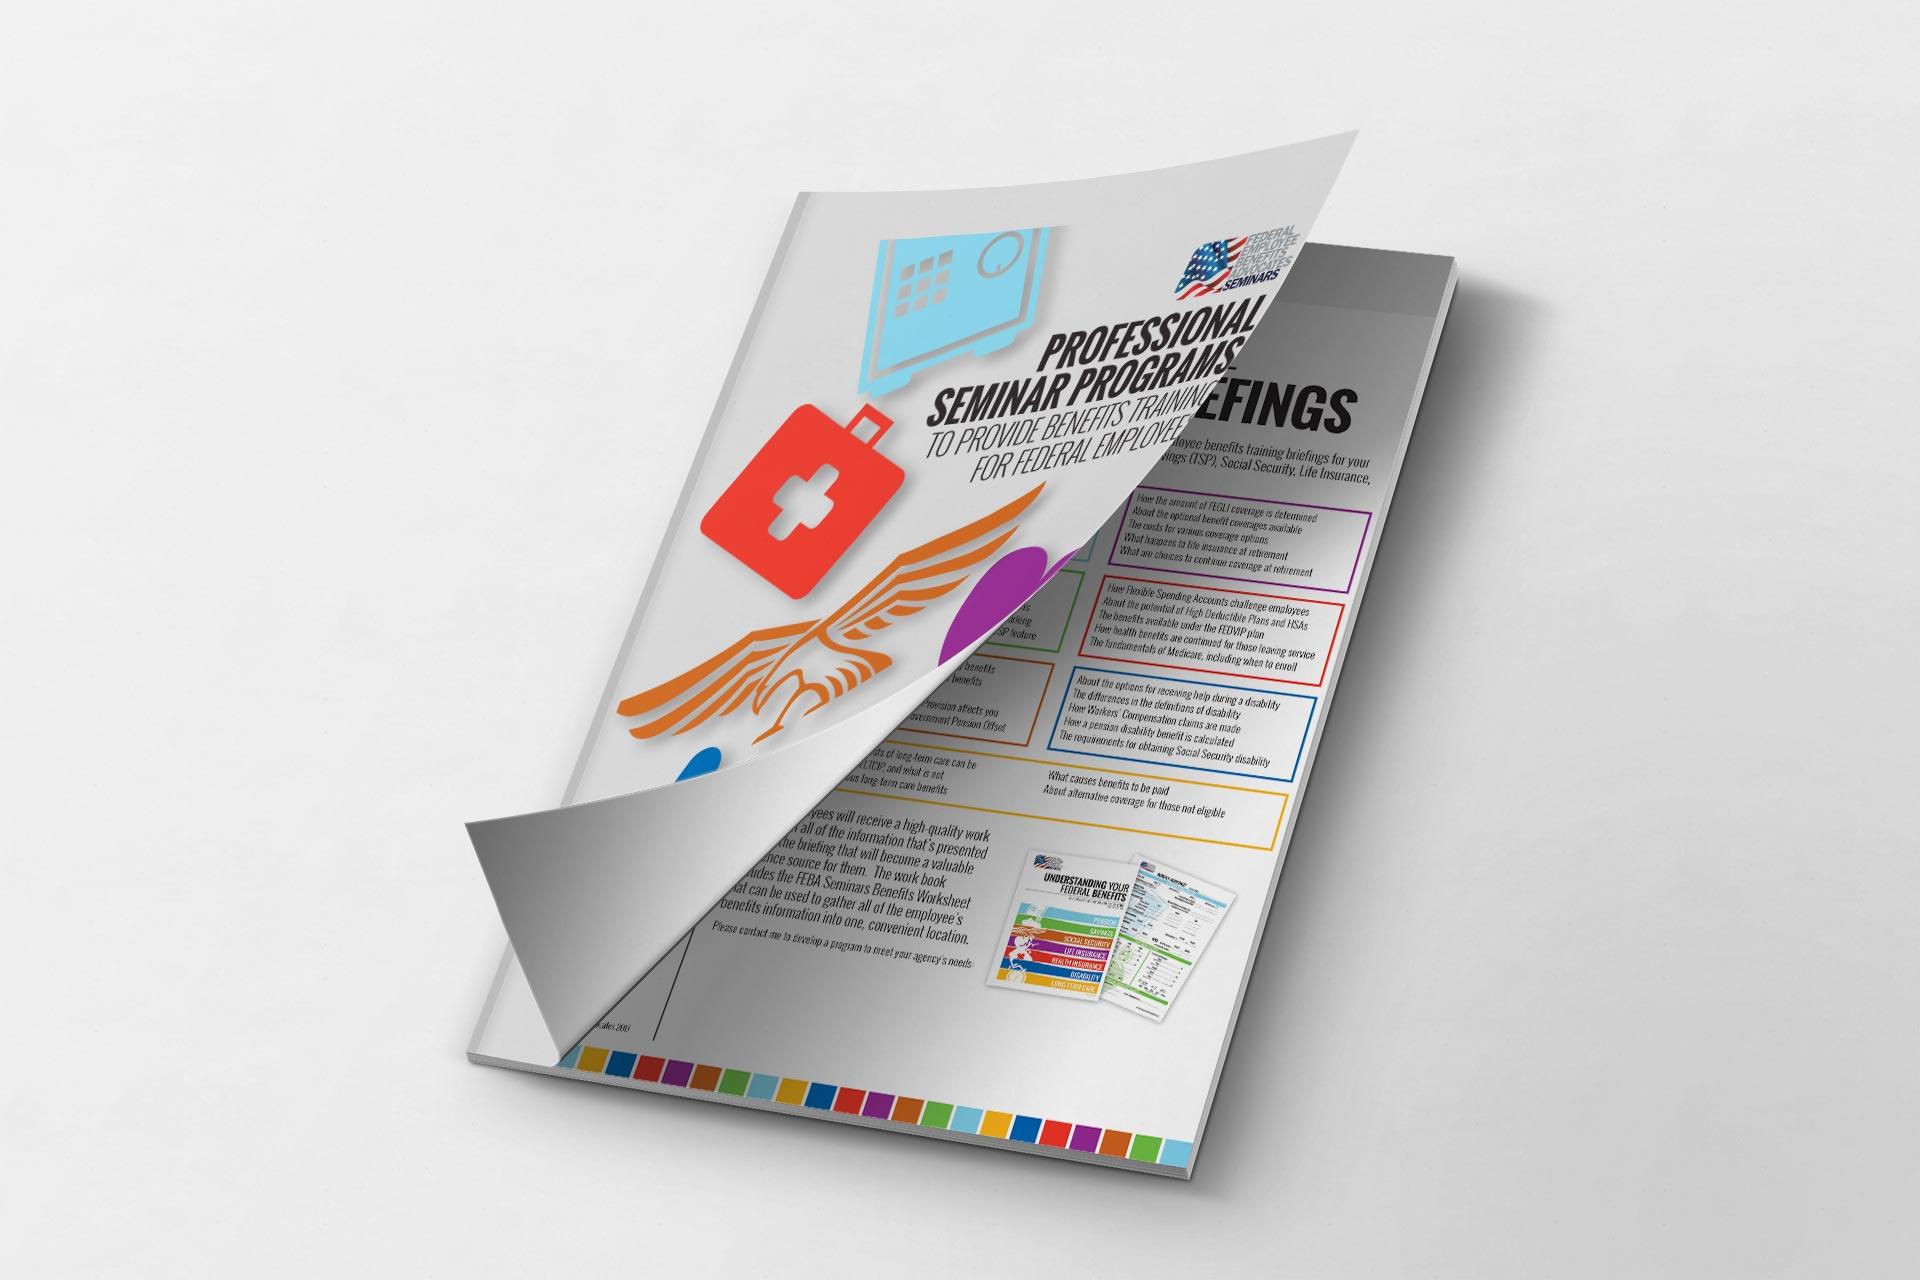 Benefits Briefing Presentation Book Laminated Federal